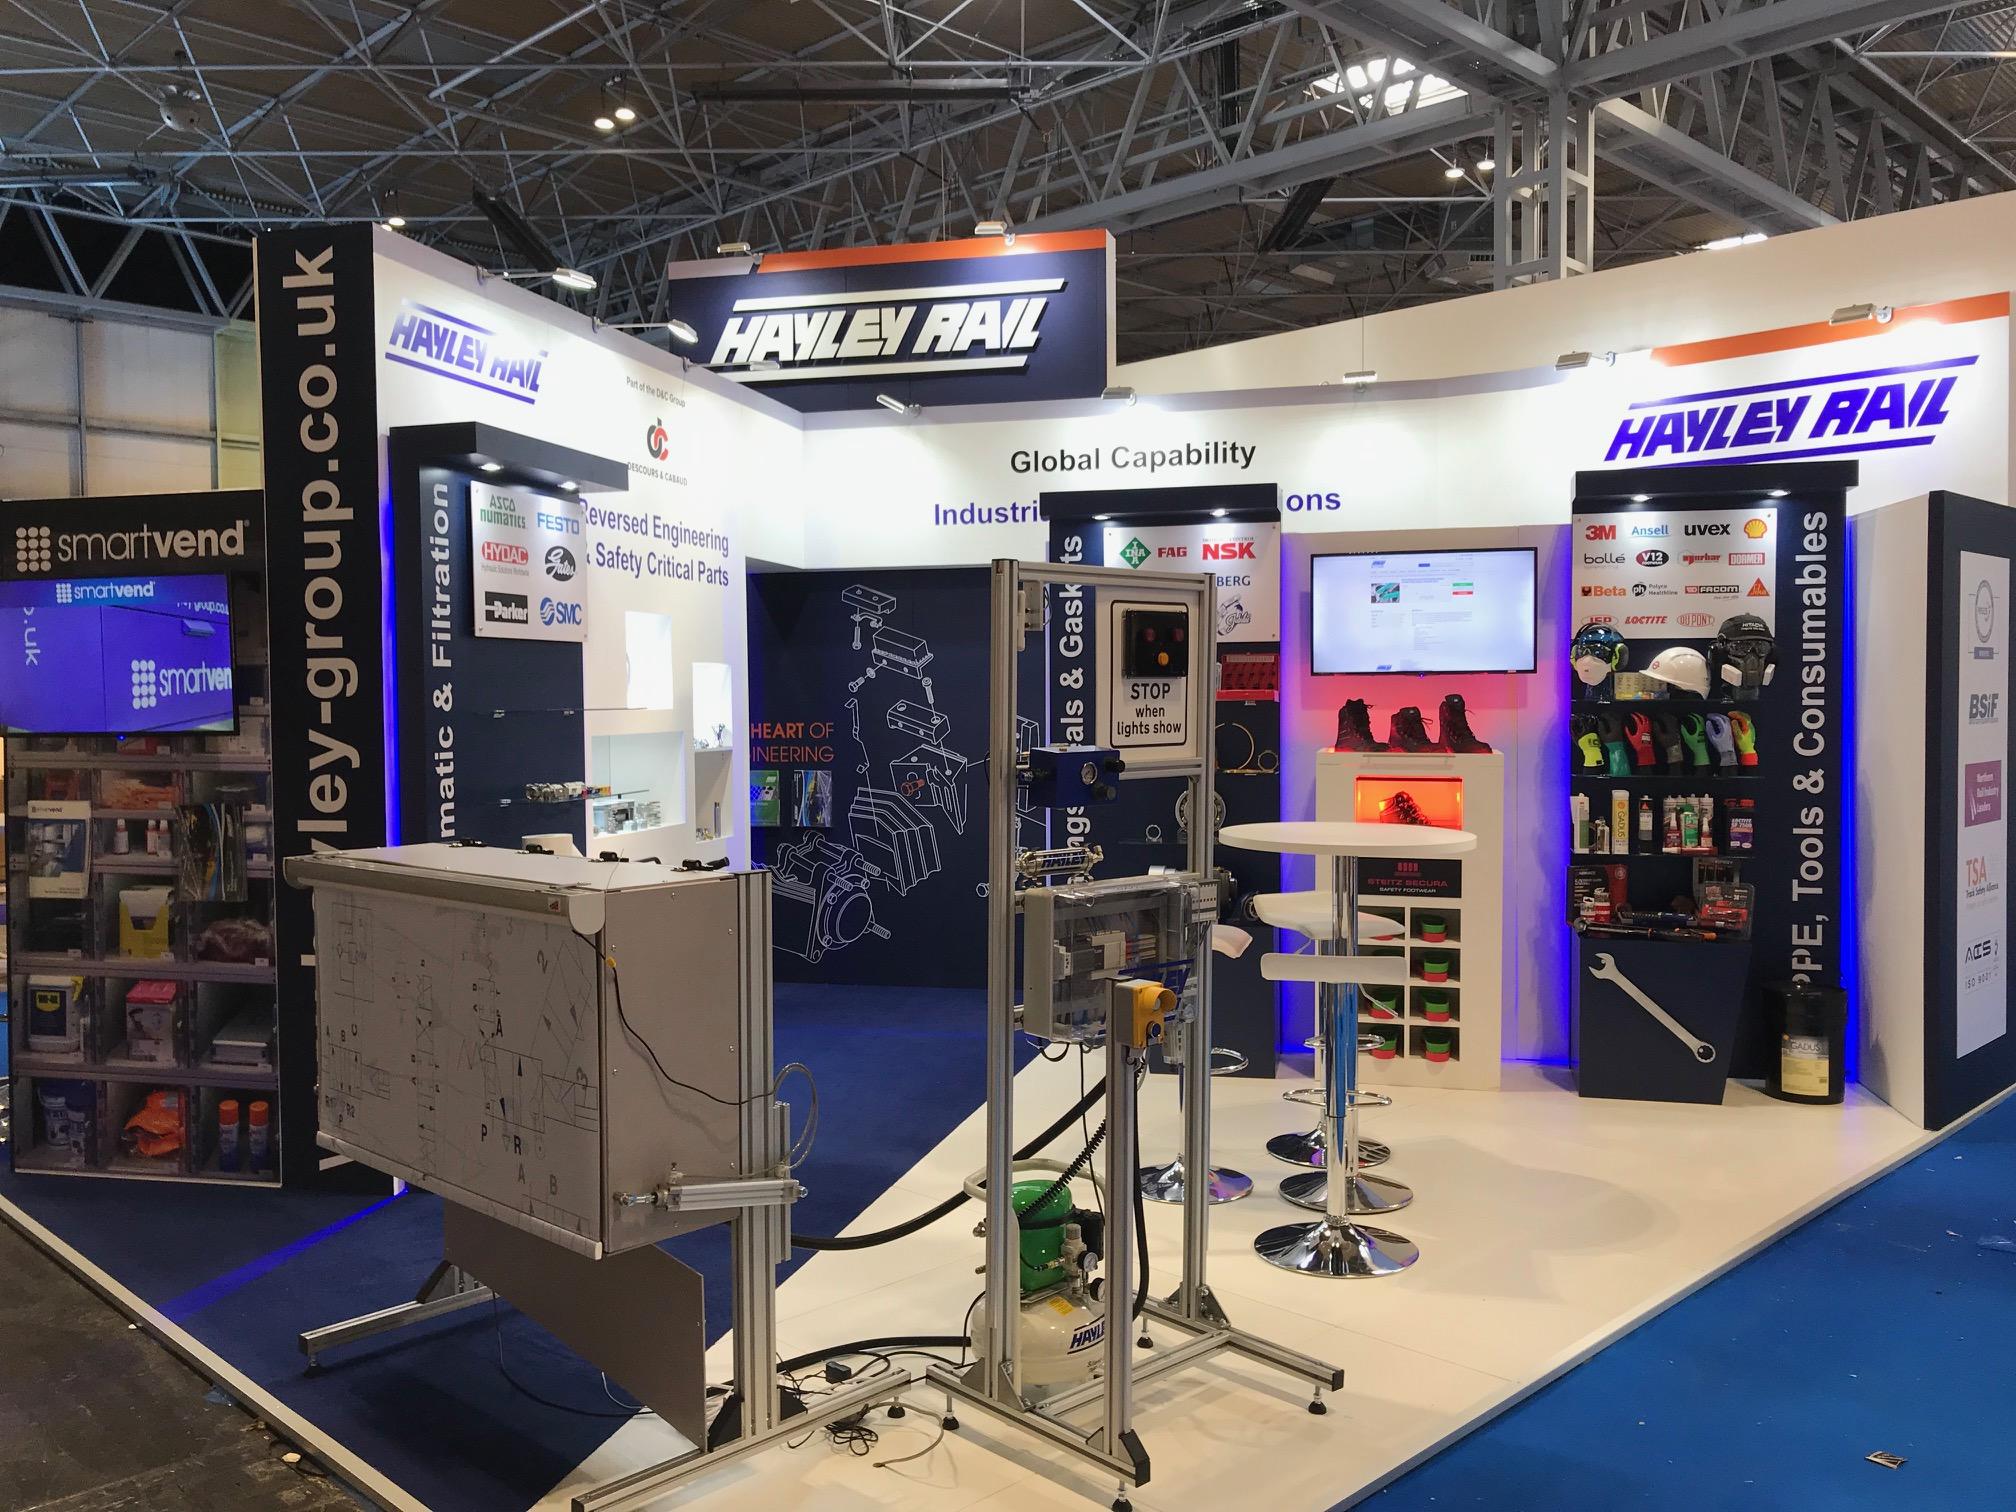 Hayley Rail Custom built stand at Railtex in Birmingham UK